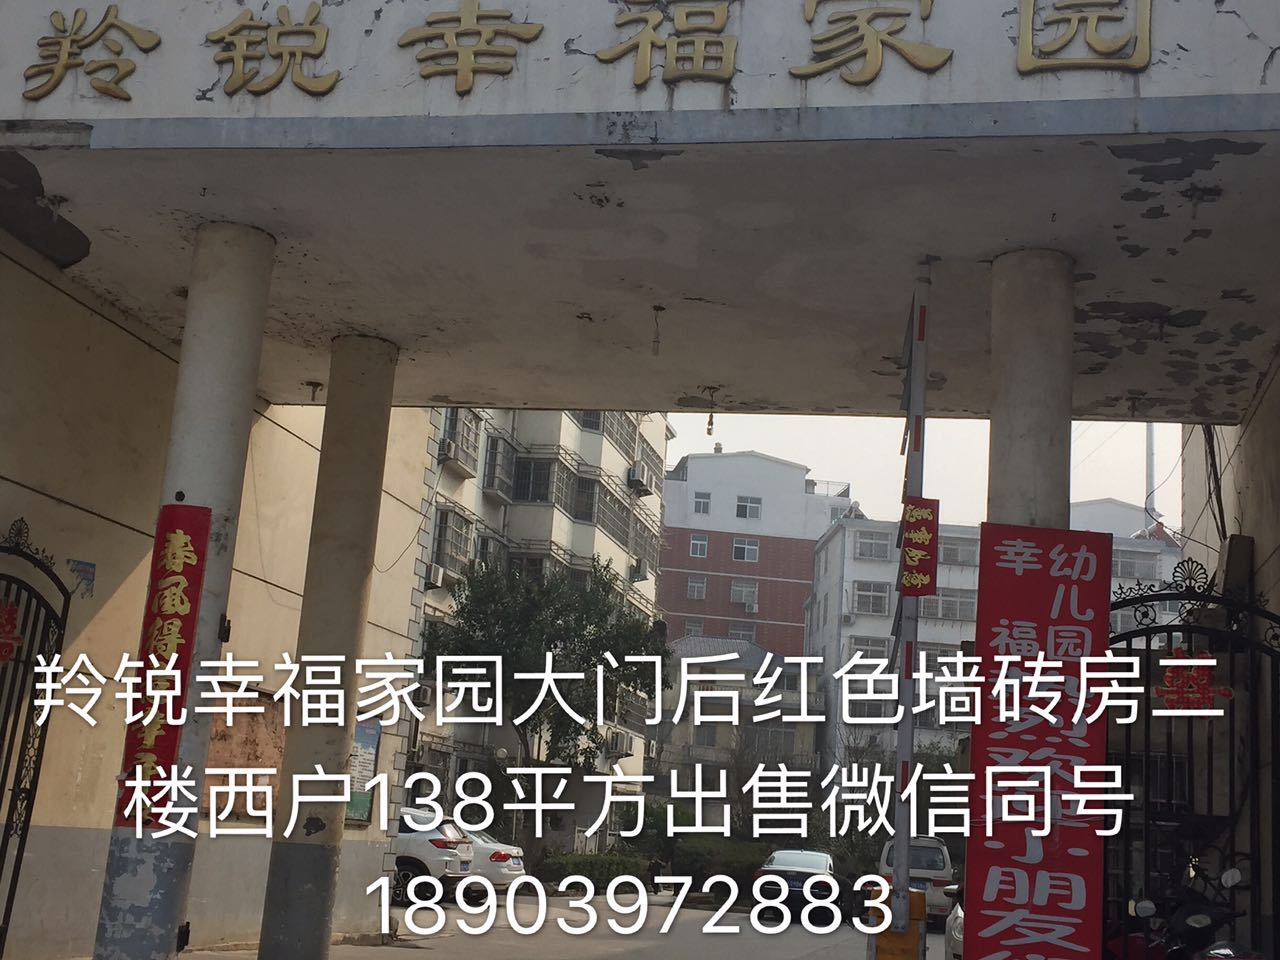 ir2153典型应用电路:主题: 新县交警工作态度不敢恭维!